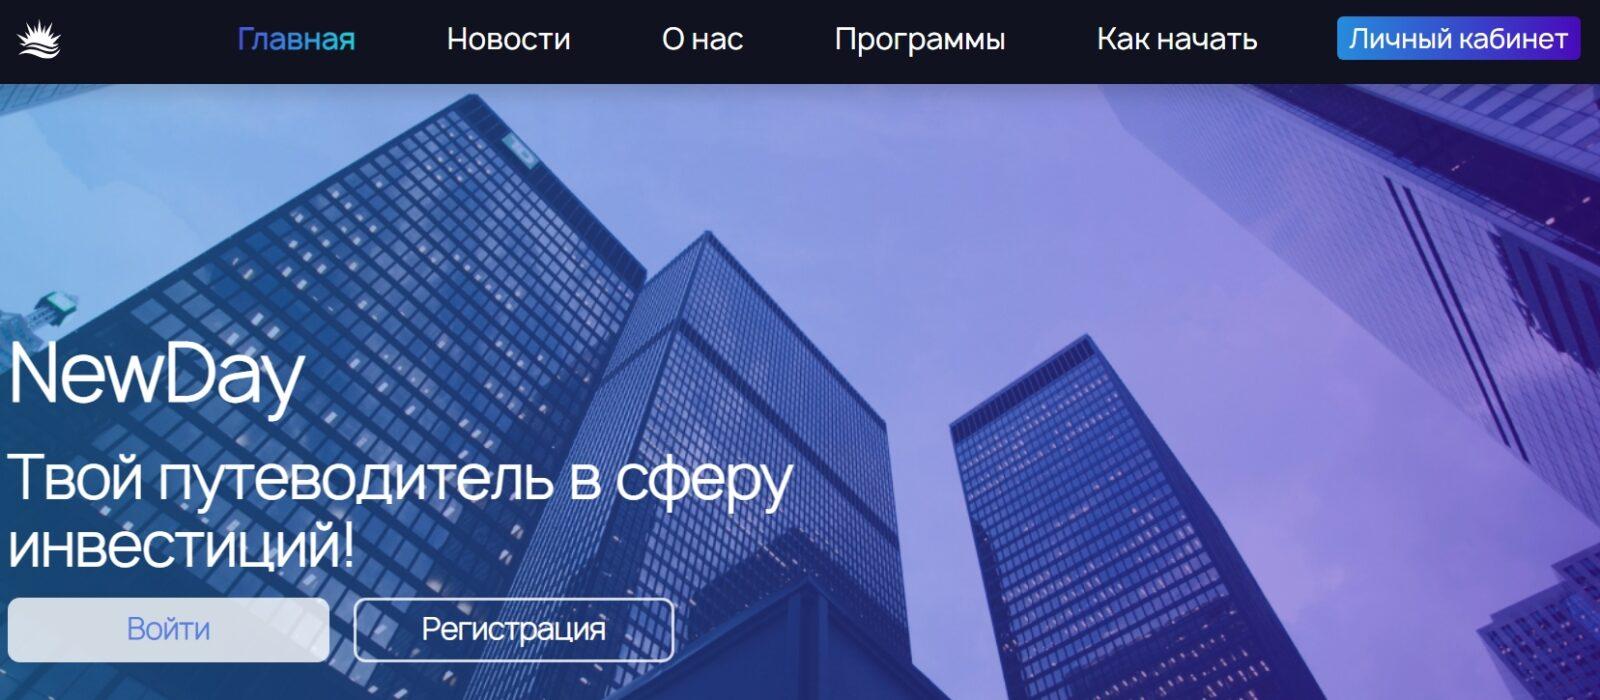 Сайт проекта New Day